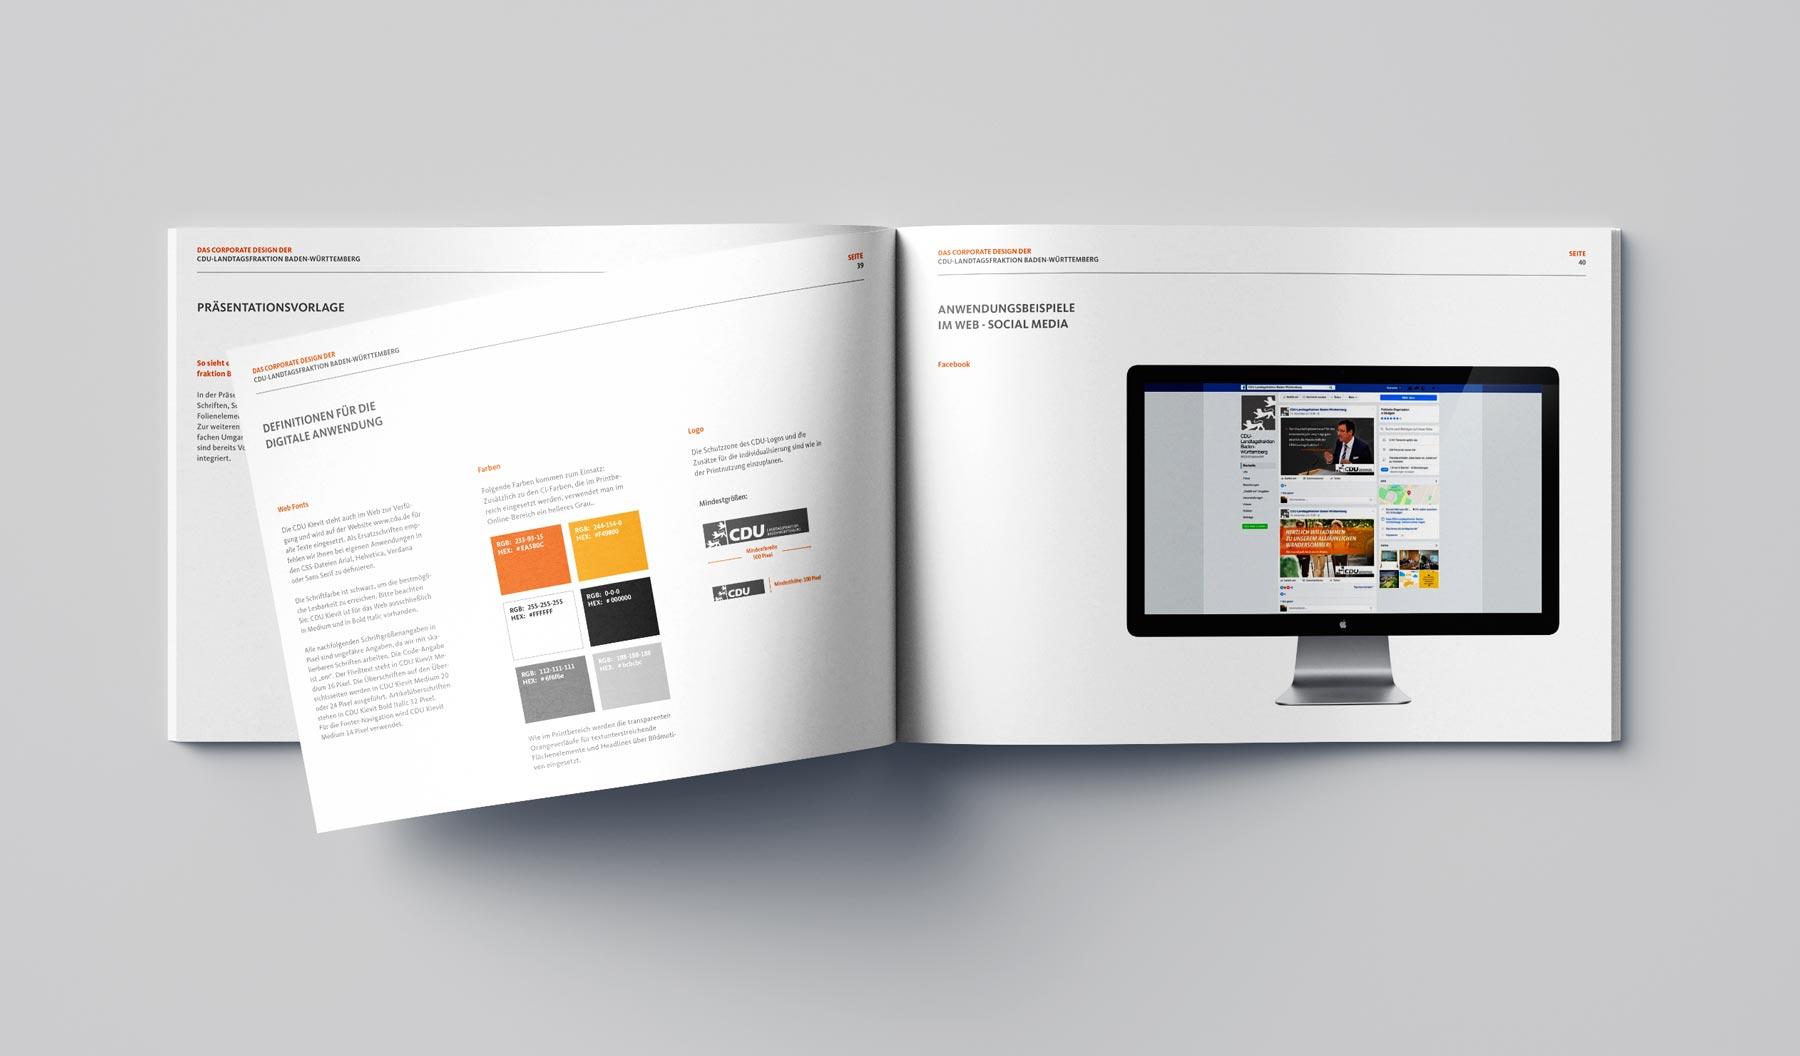 CDU_LF_BW, Styleguide, Corporate Design Relaunch, Redesign, Inhalt, Digital